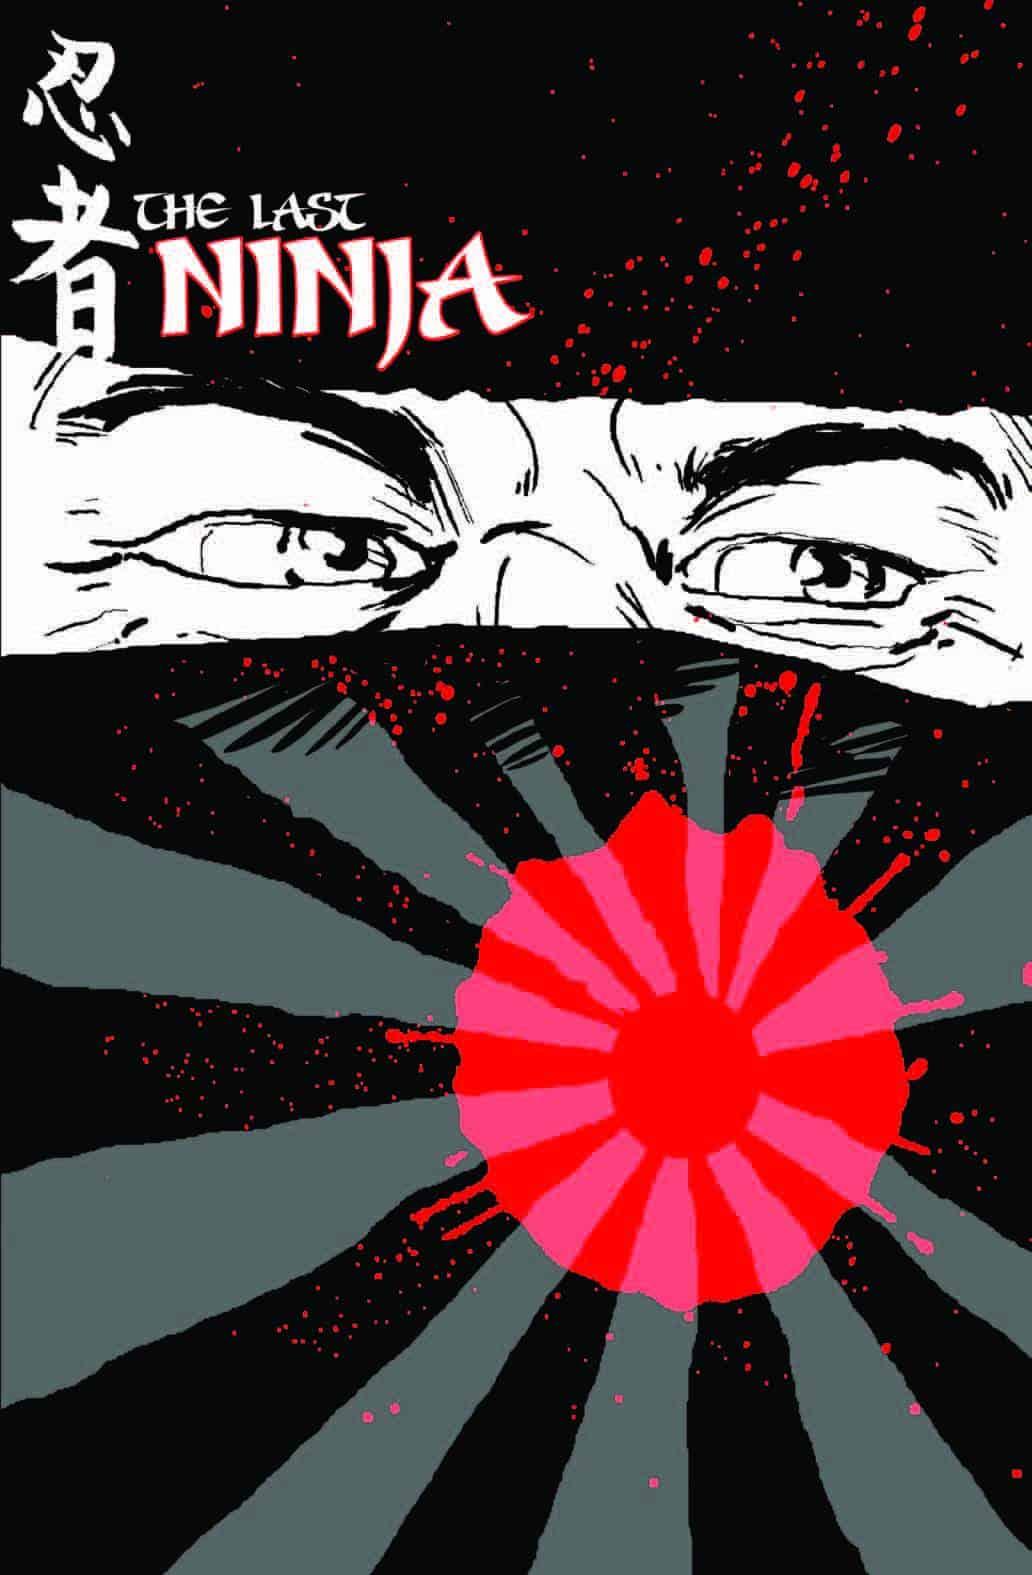 The-Last-Ninja-Cover